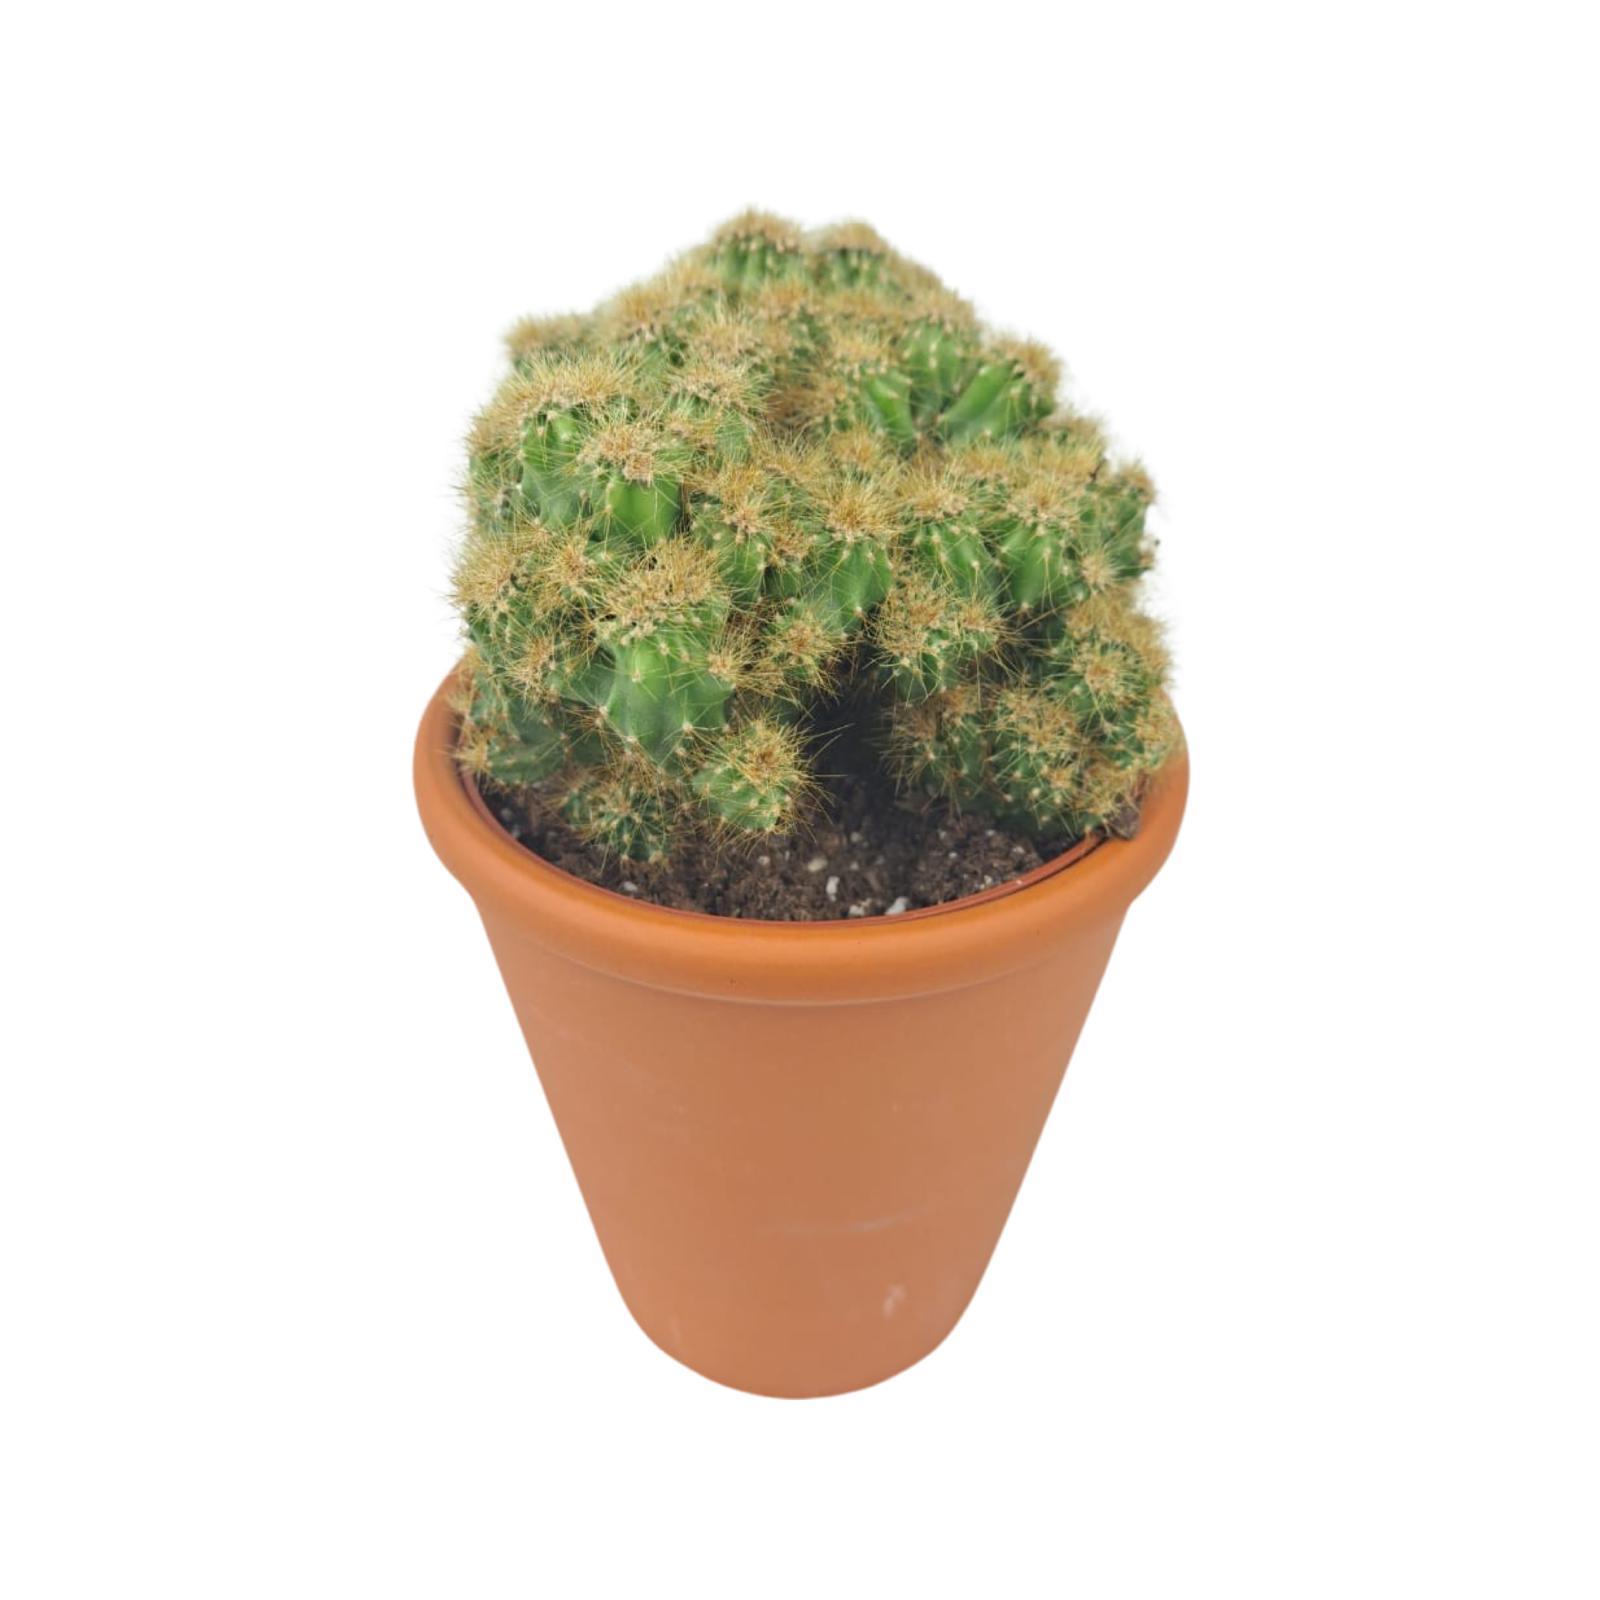 Cactus Mix Wholesale Plants Indoor Plants